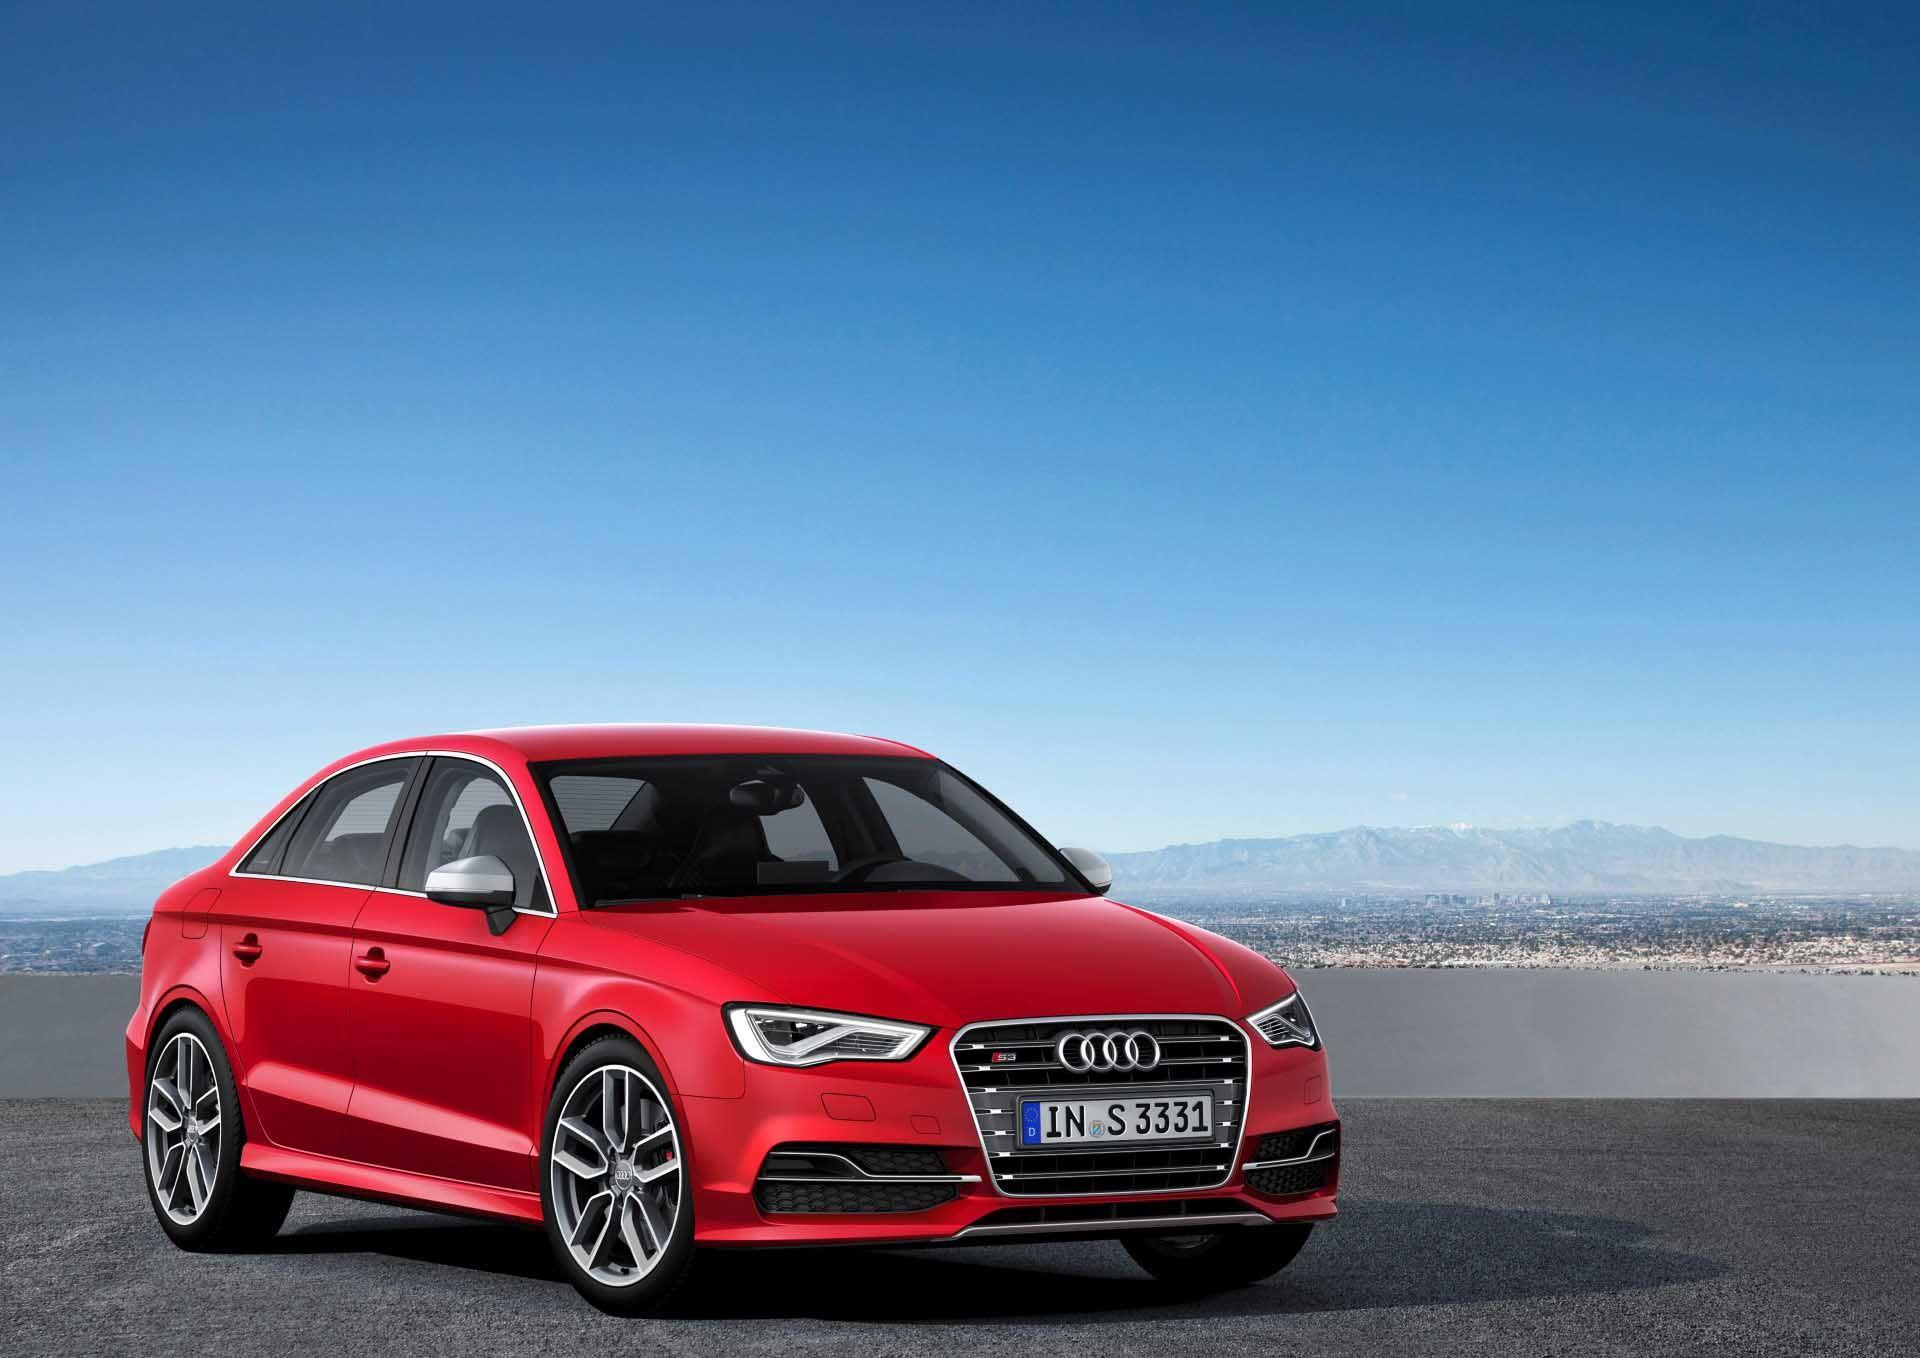 Download Beauty Audi S3 Sedan Price Hd Desktop Wallpaper Full Size 246